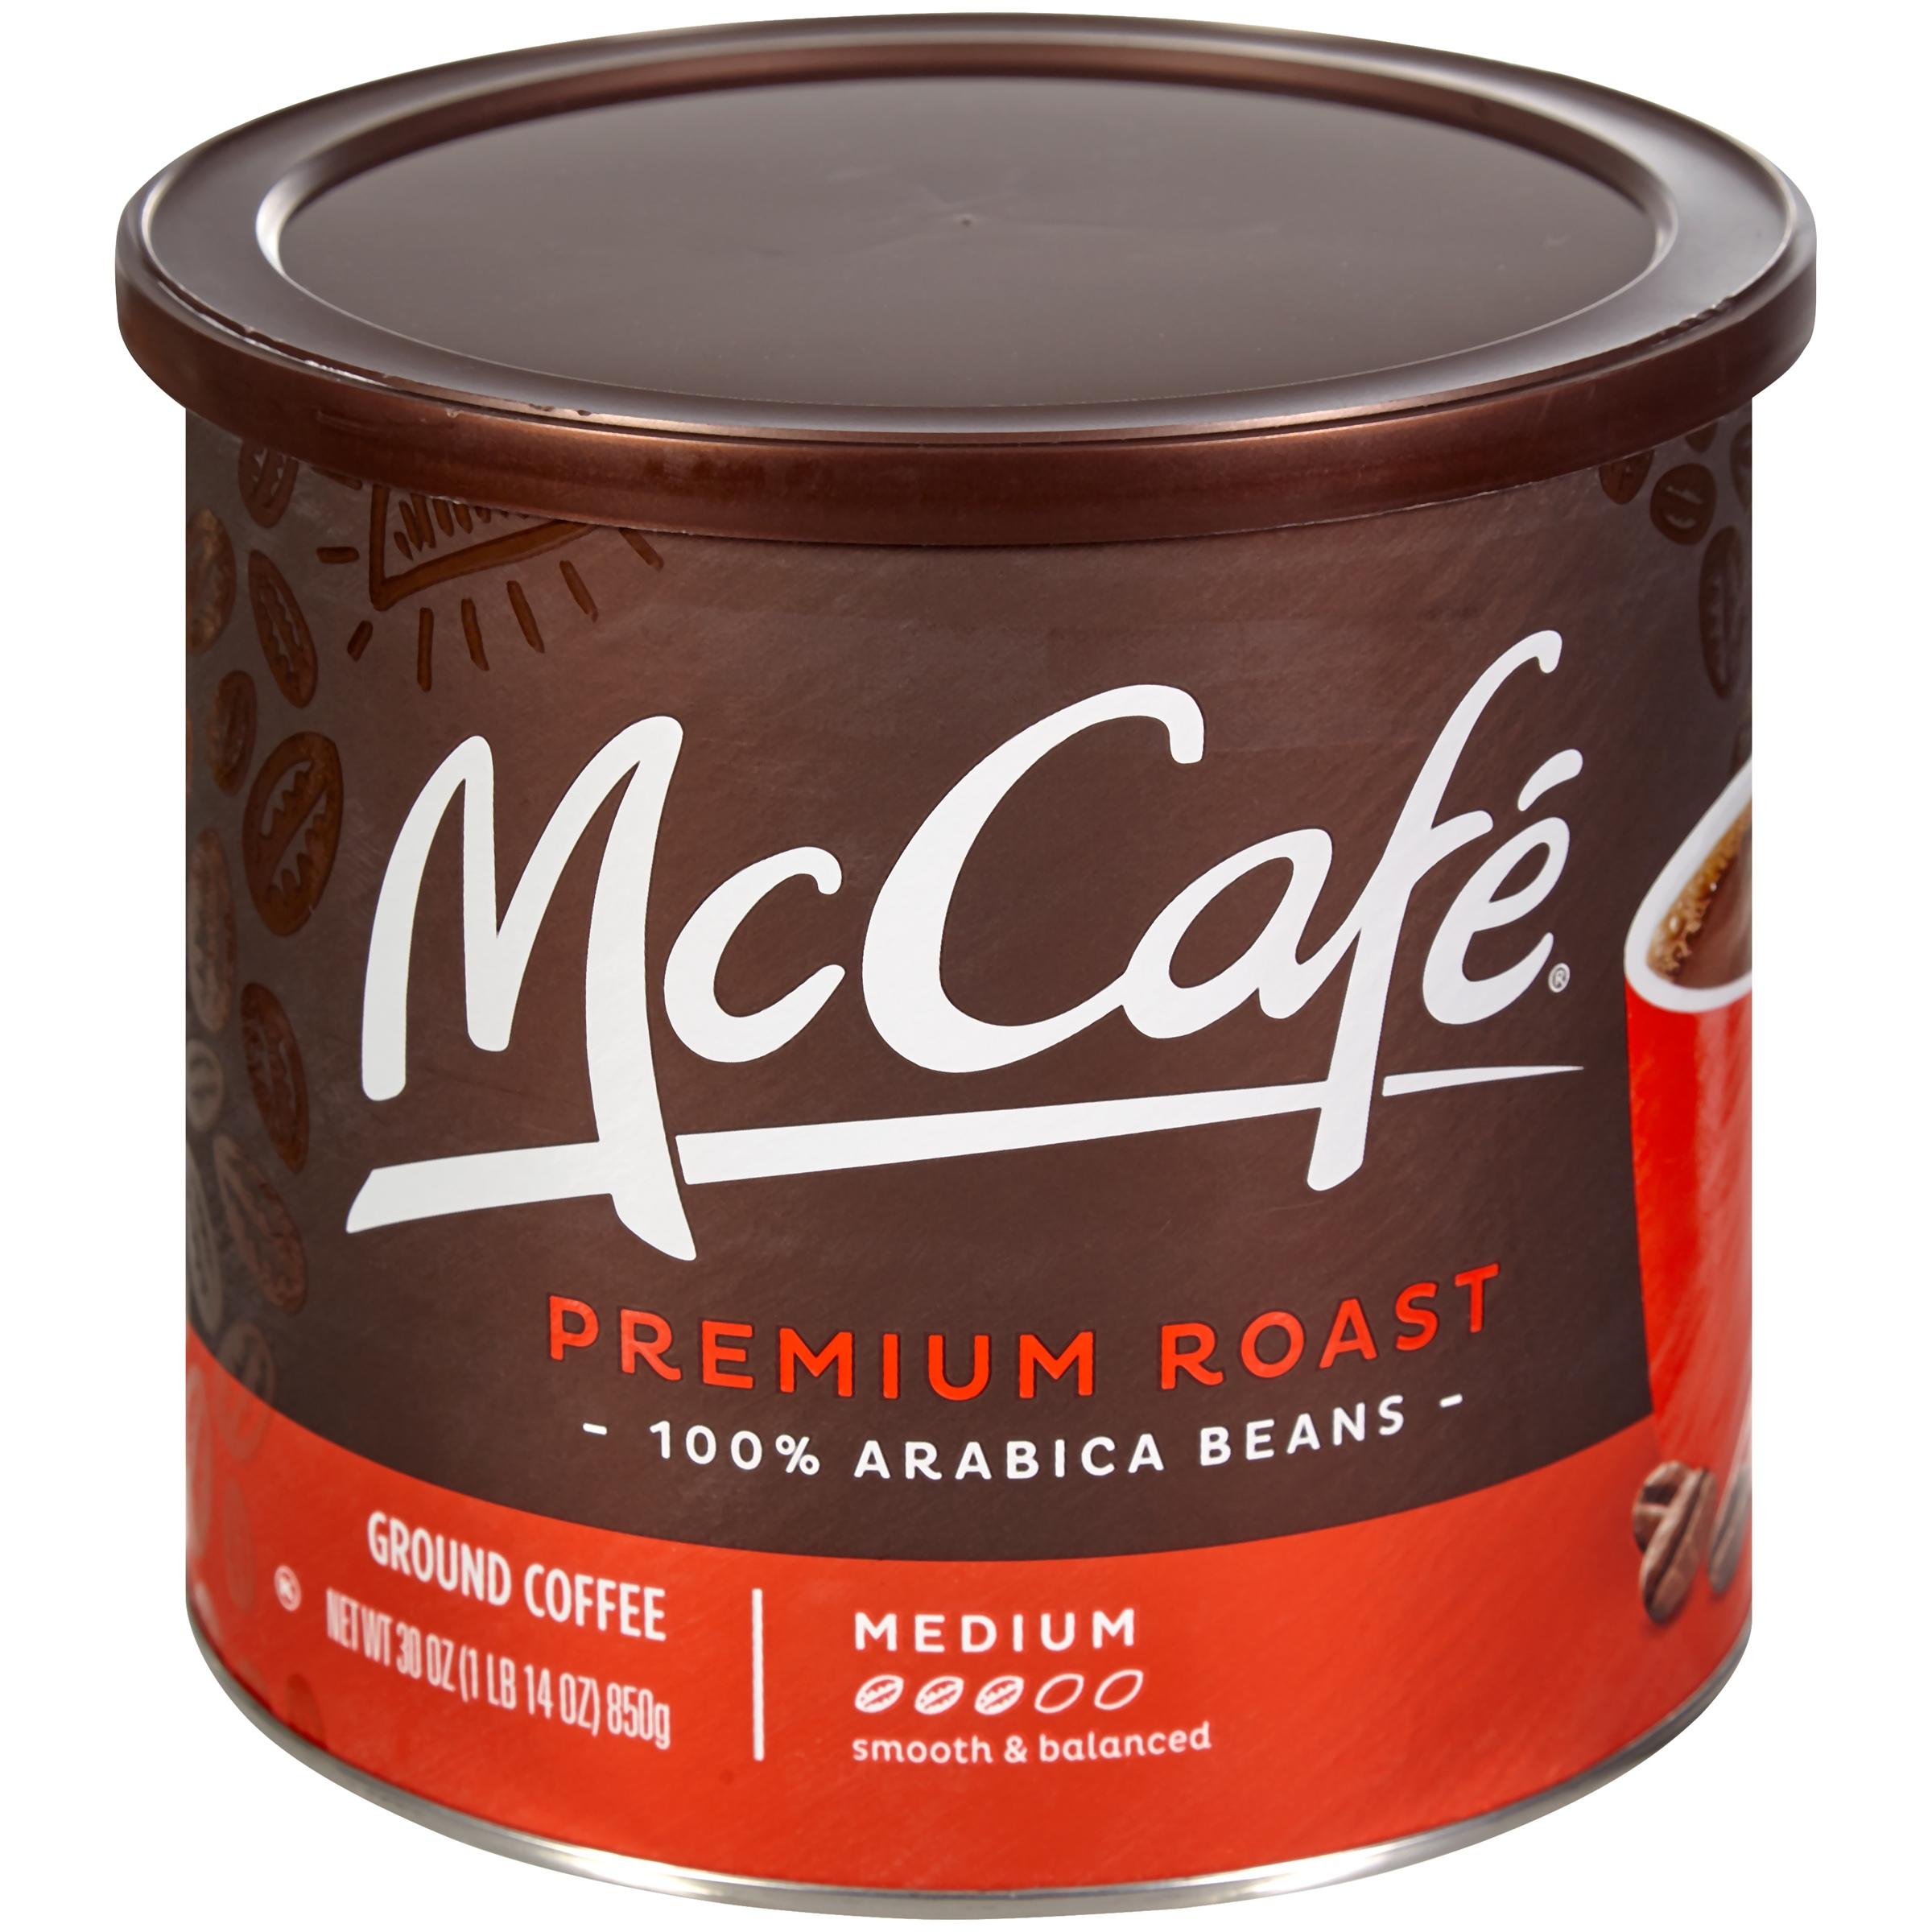 McCafé Premium Roast Ground Coffee 30 oz. Canister